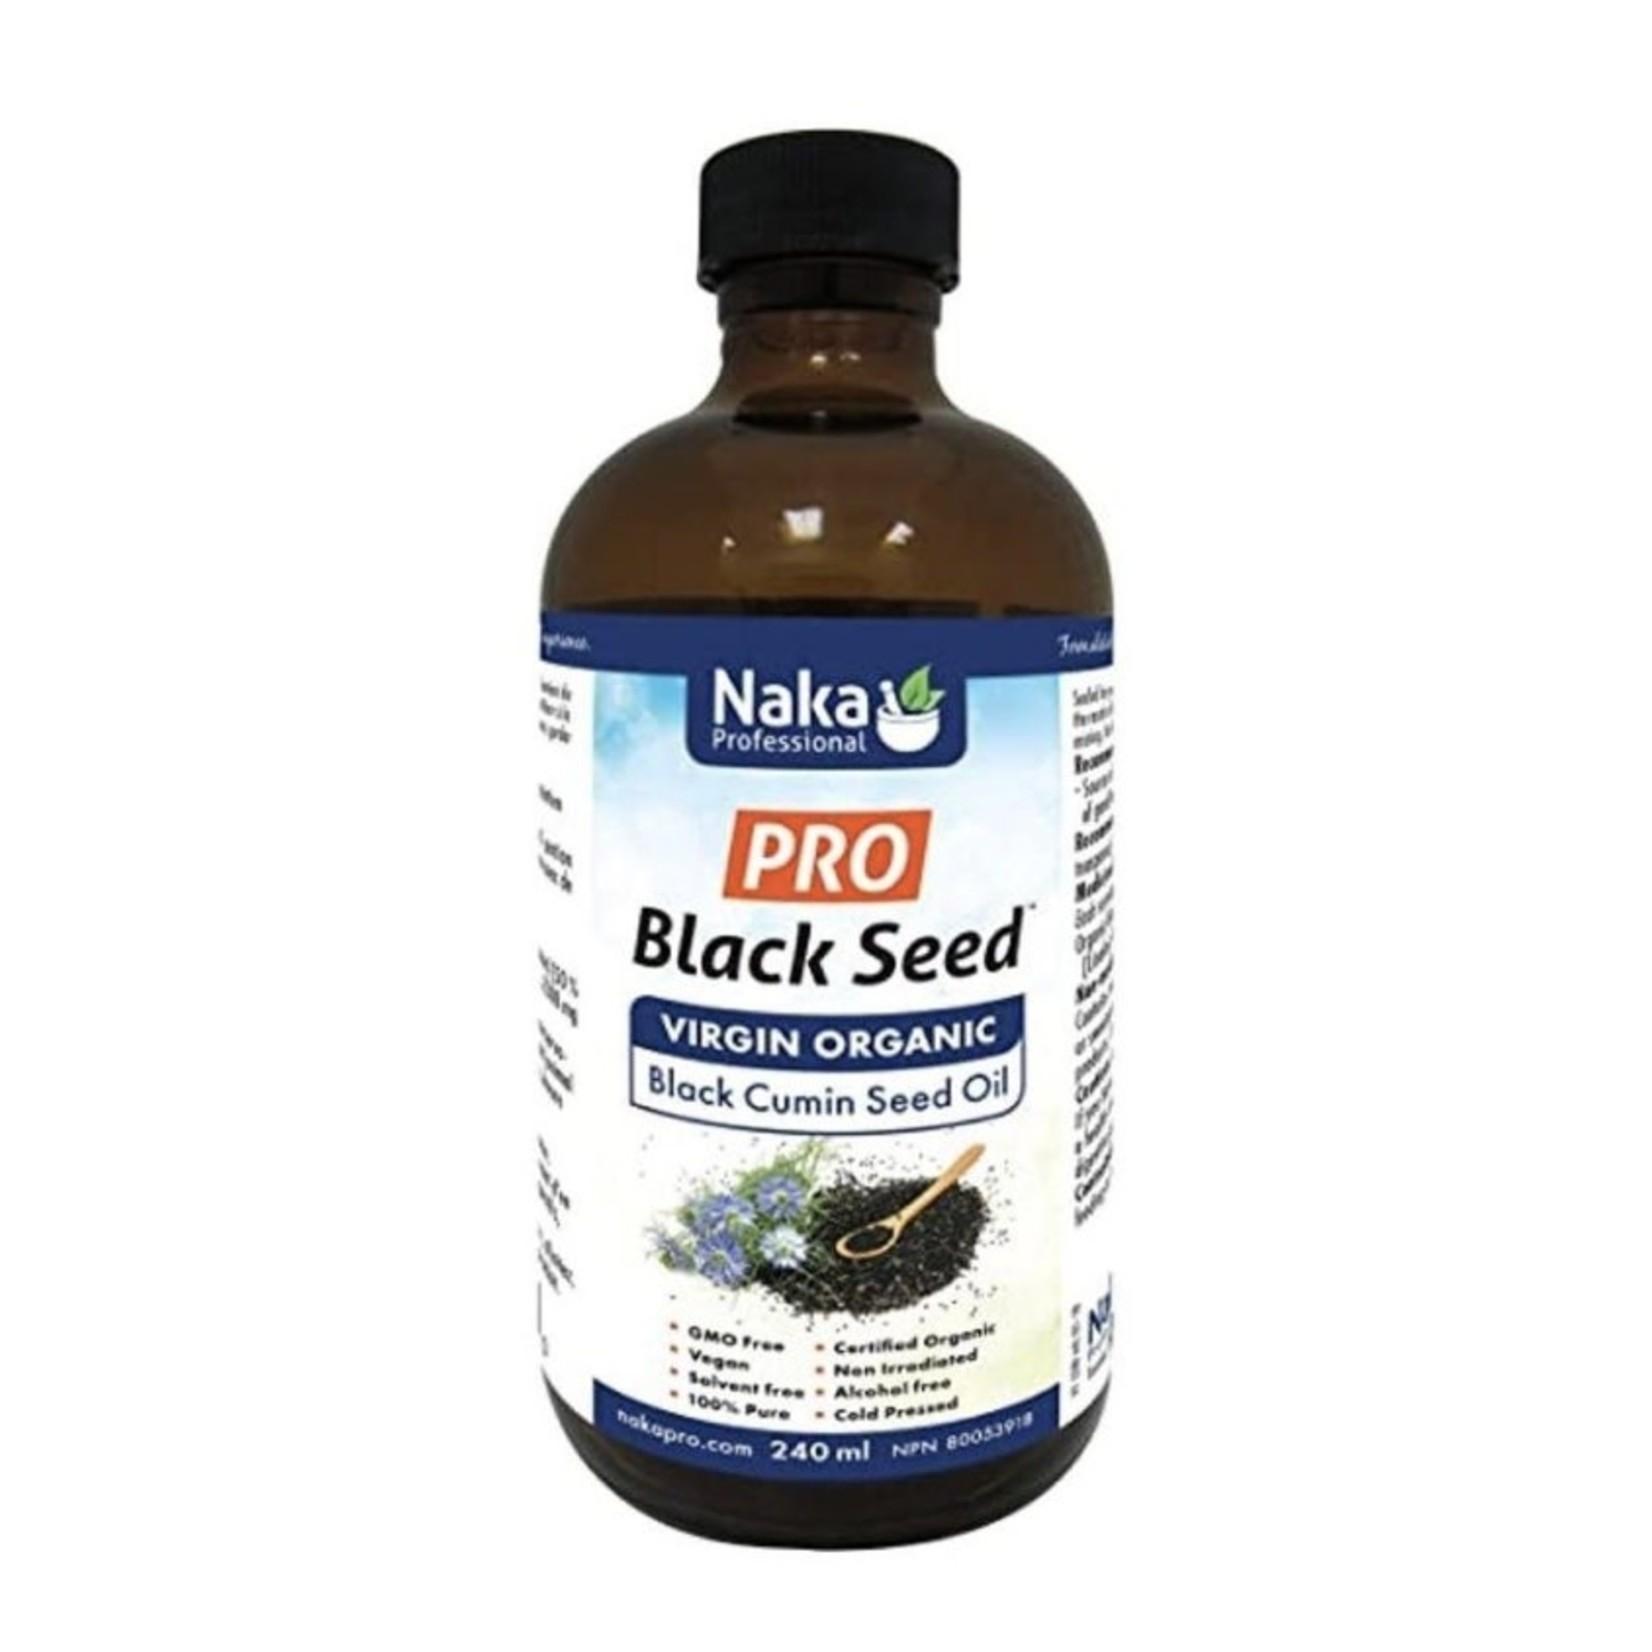 Naka Naka Pro Black Seed 240ml